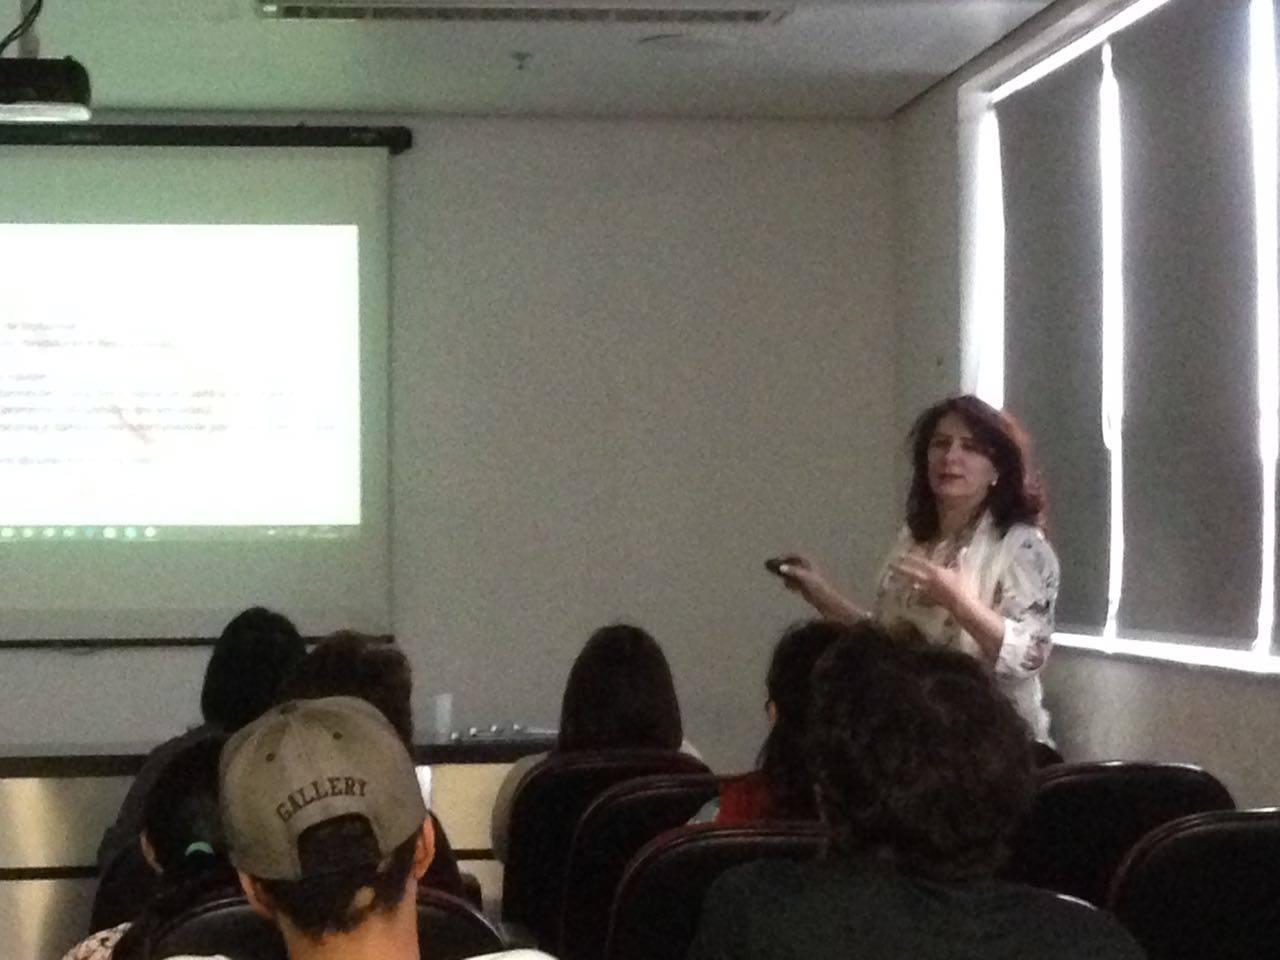 Angela Gardinalli palestra Empreendedorismo Feminino na Prática